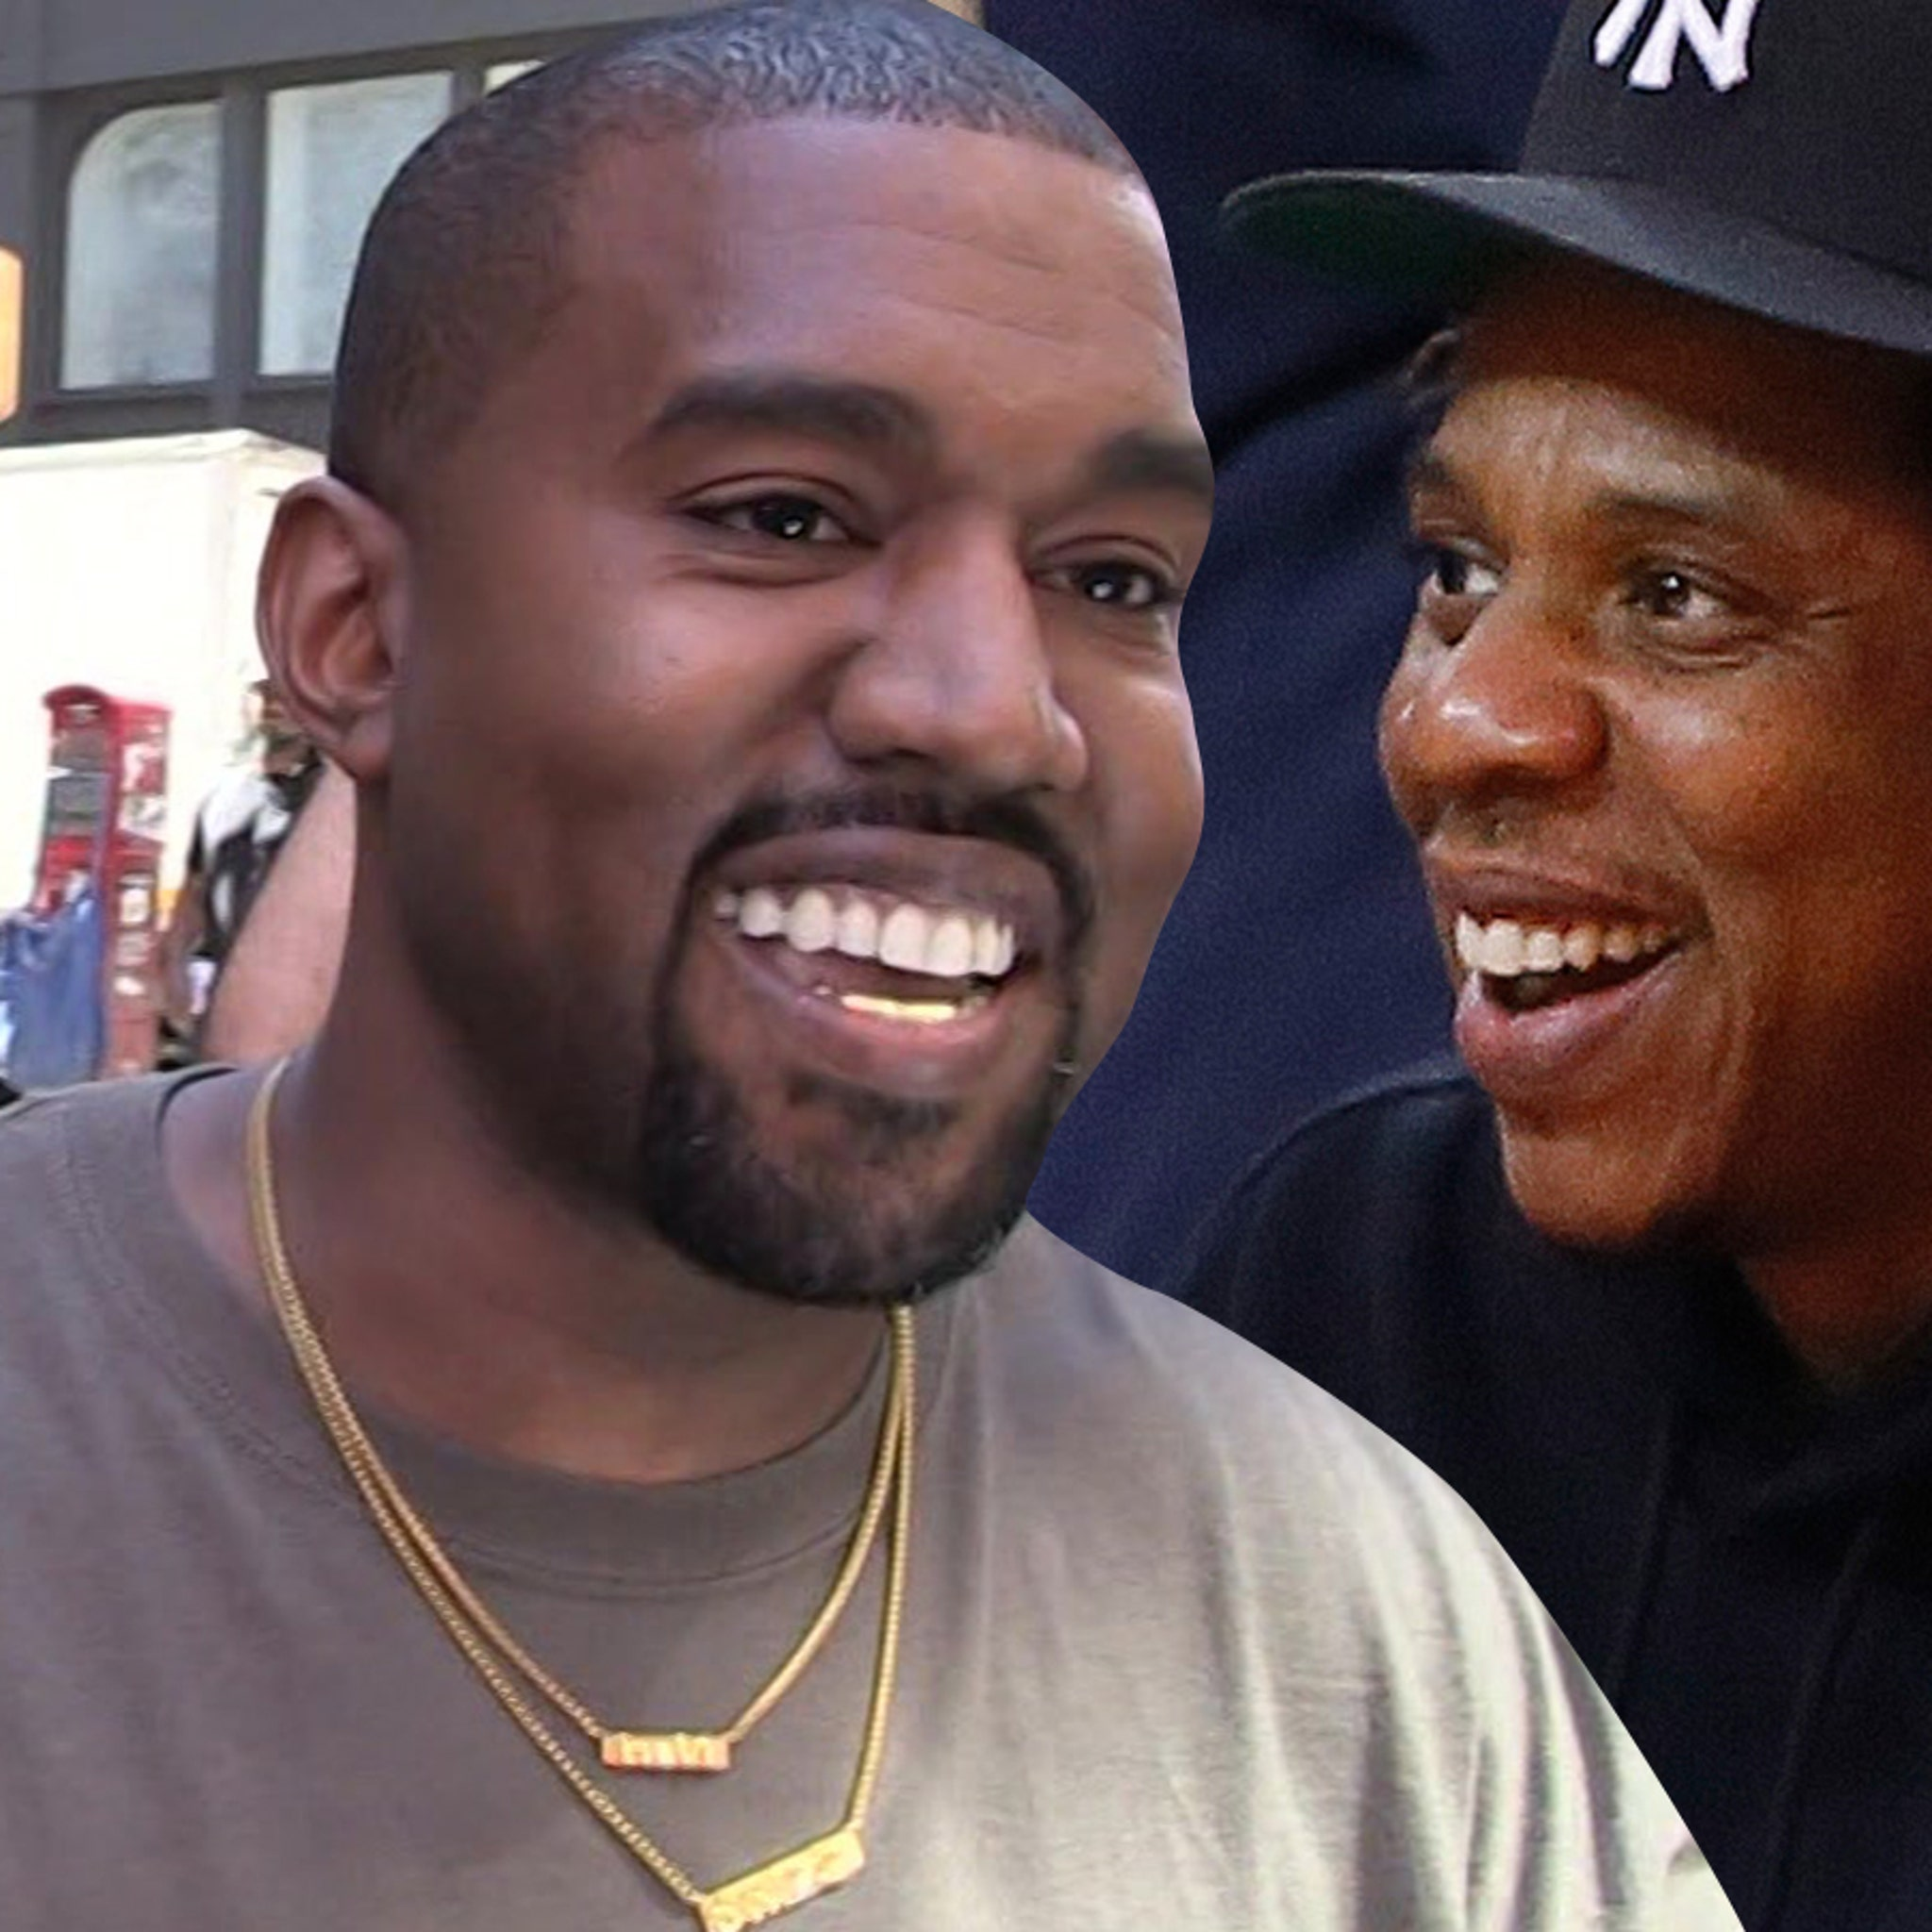 Kanye West and Jay-Z's Tidal Beef Settled, Already Back in Biz Together